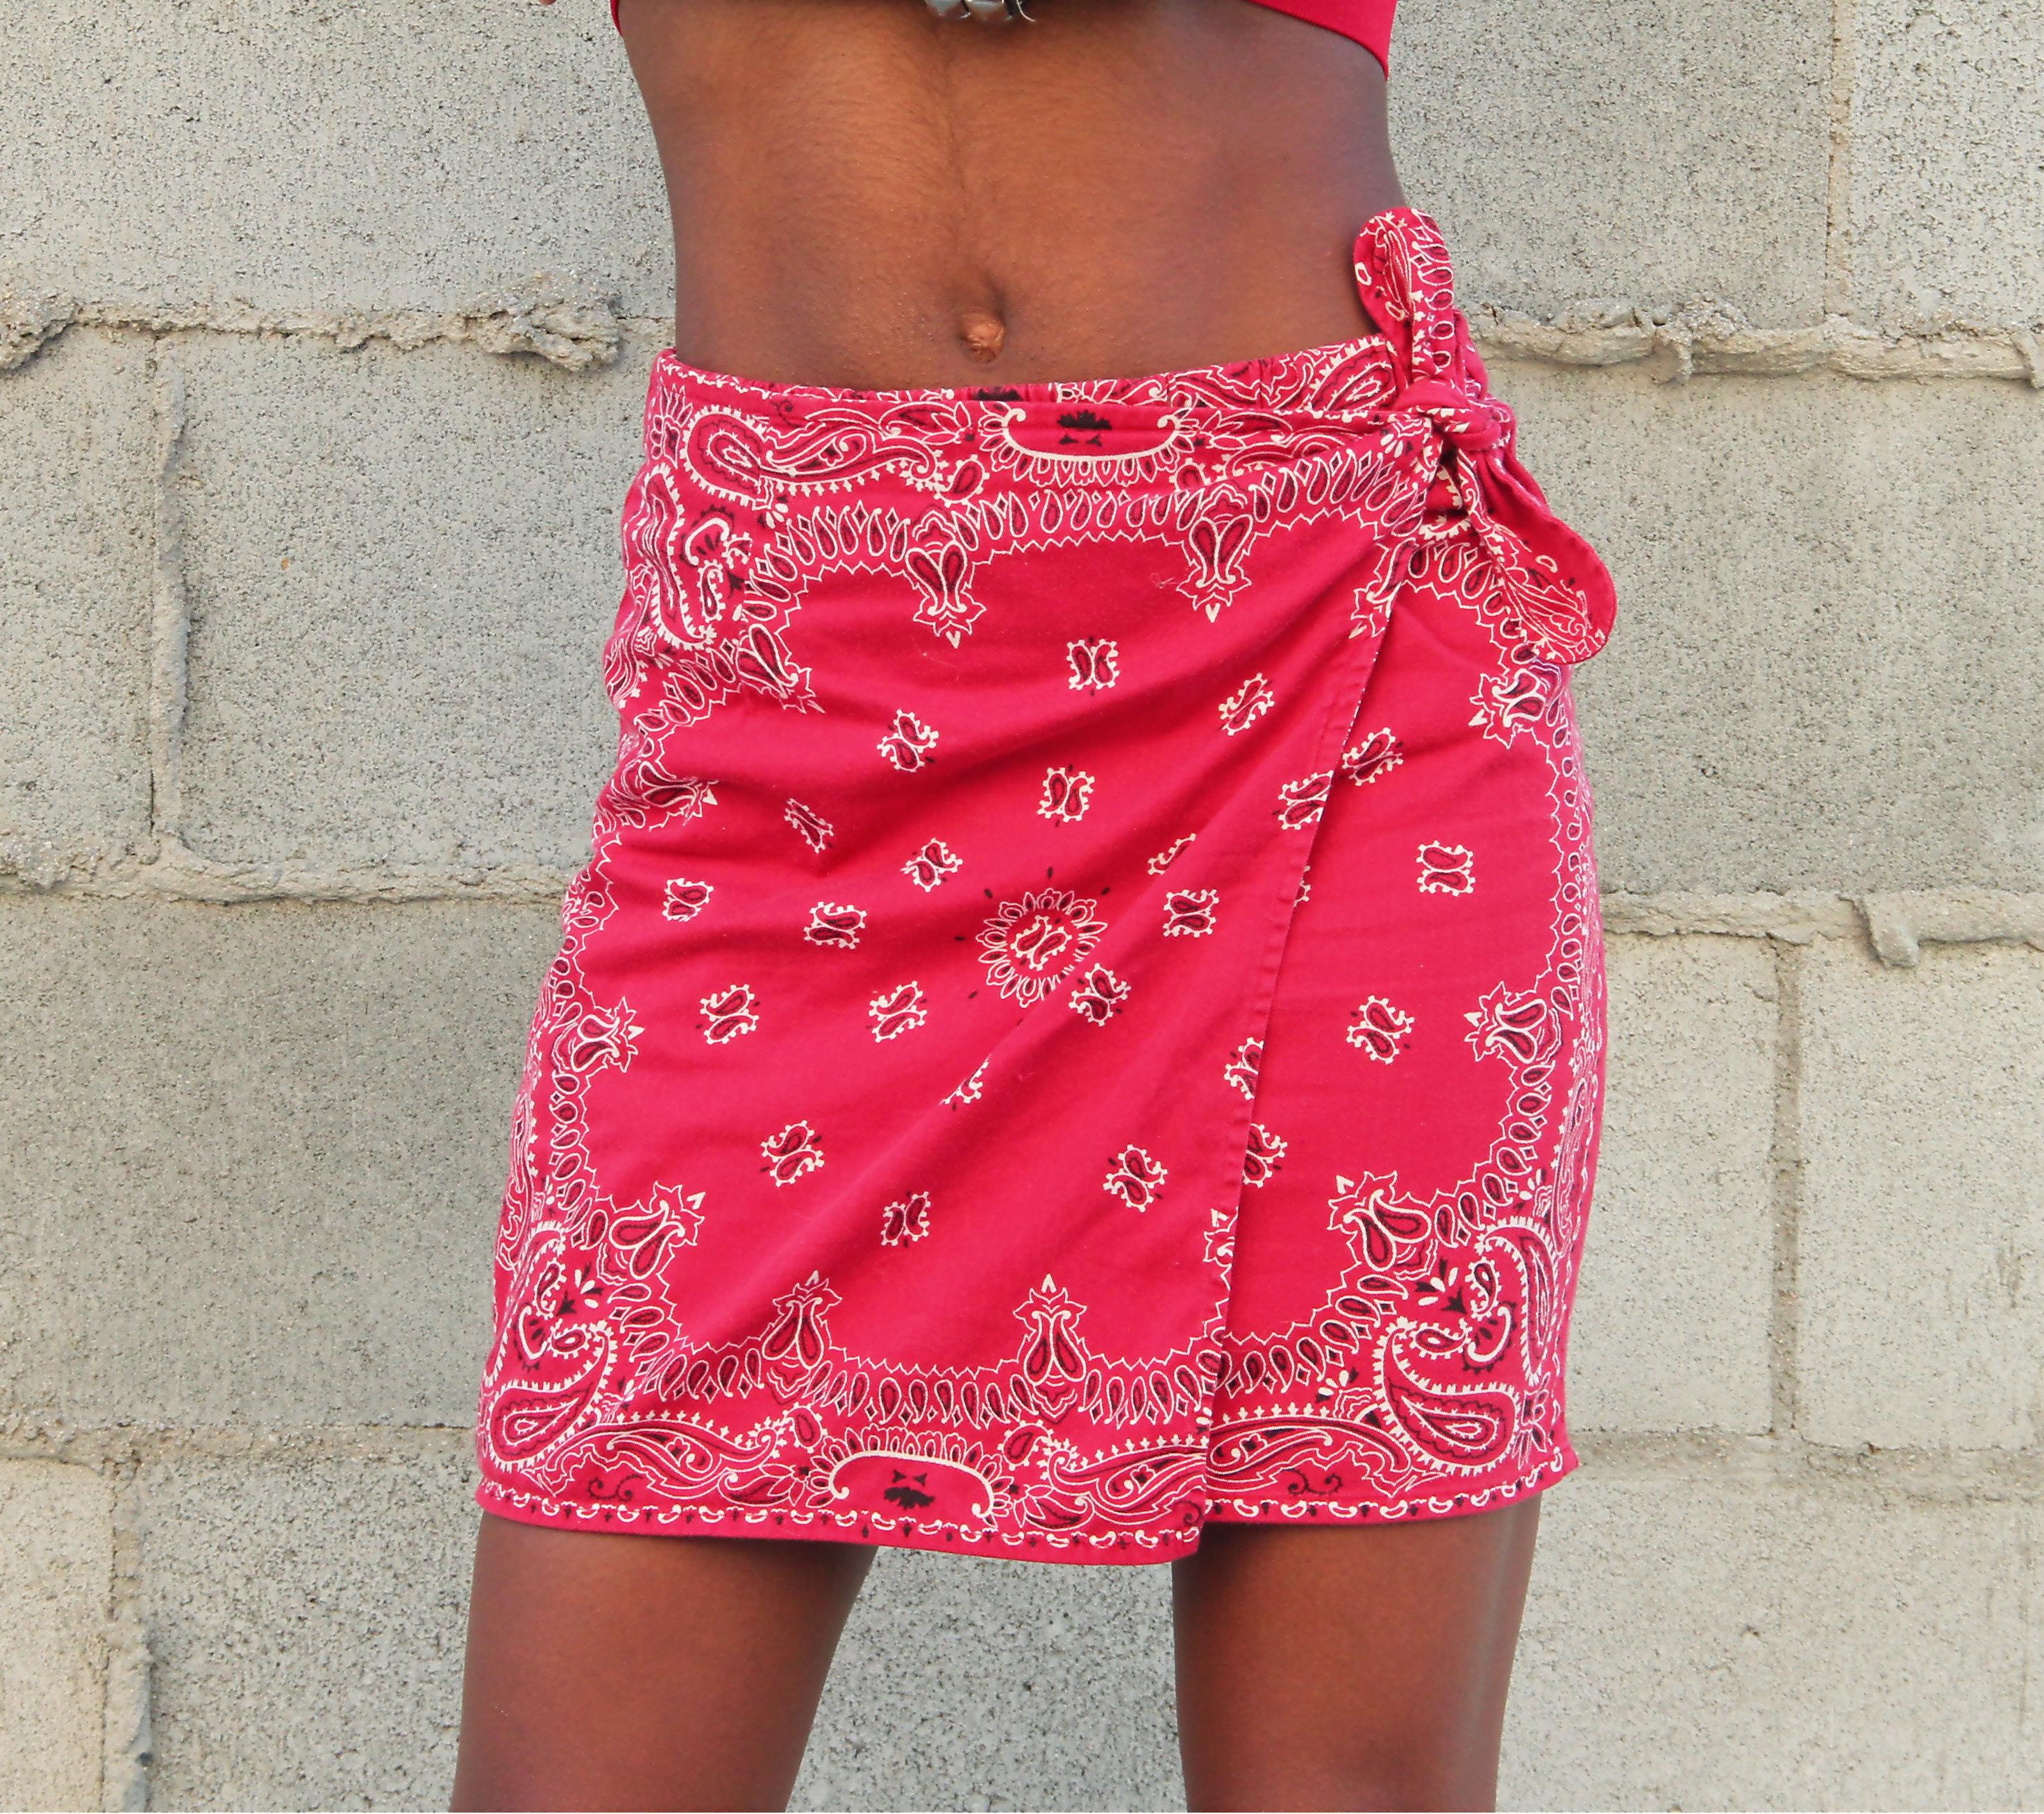 Blood Red Bandana Skirt - Imagez co